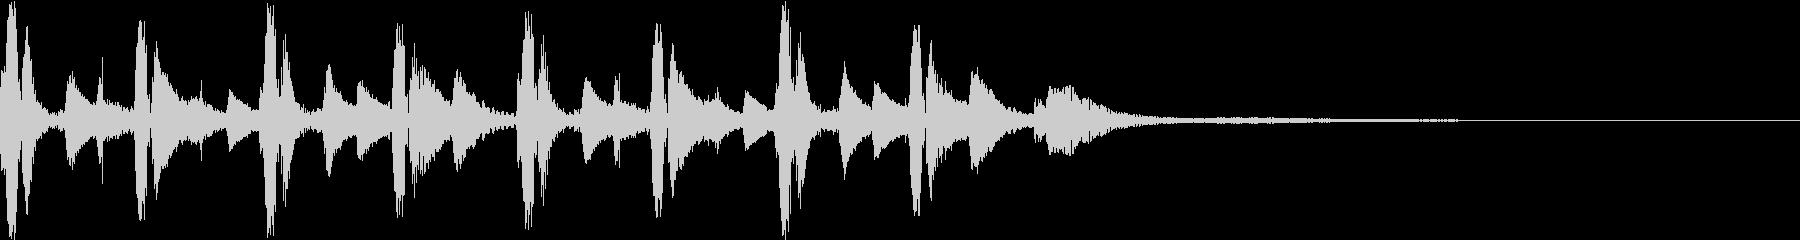 Cute heartwarming opening jingle's unreproduced waveform